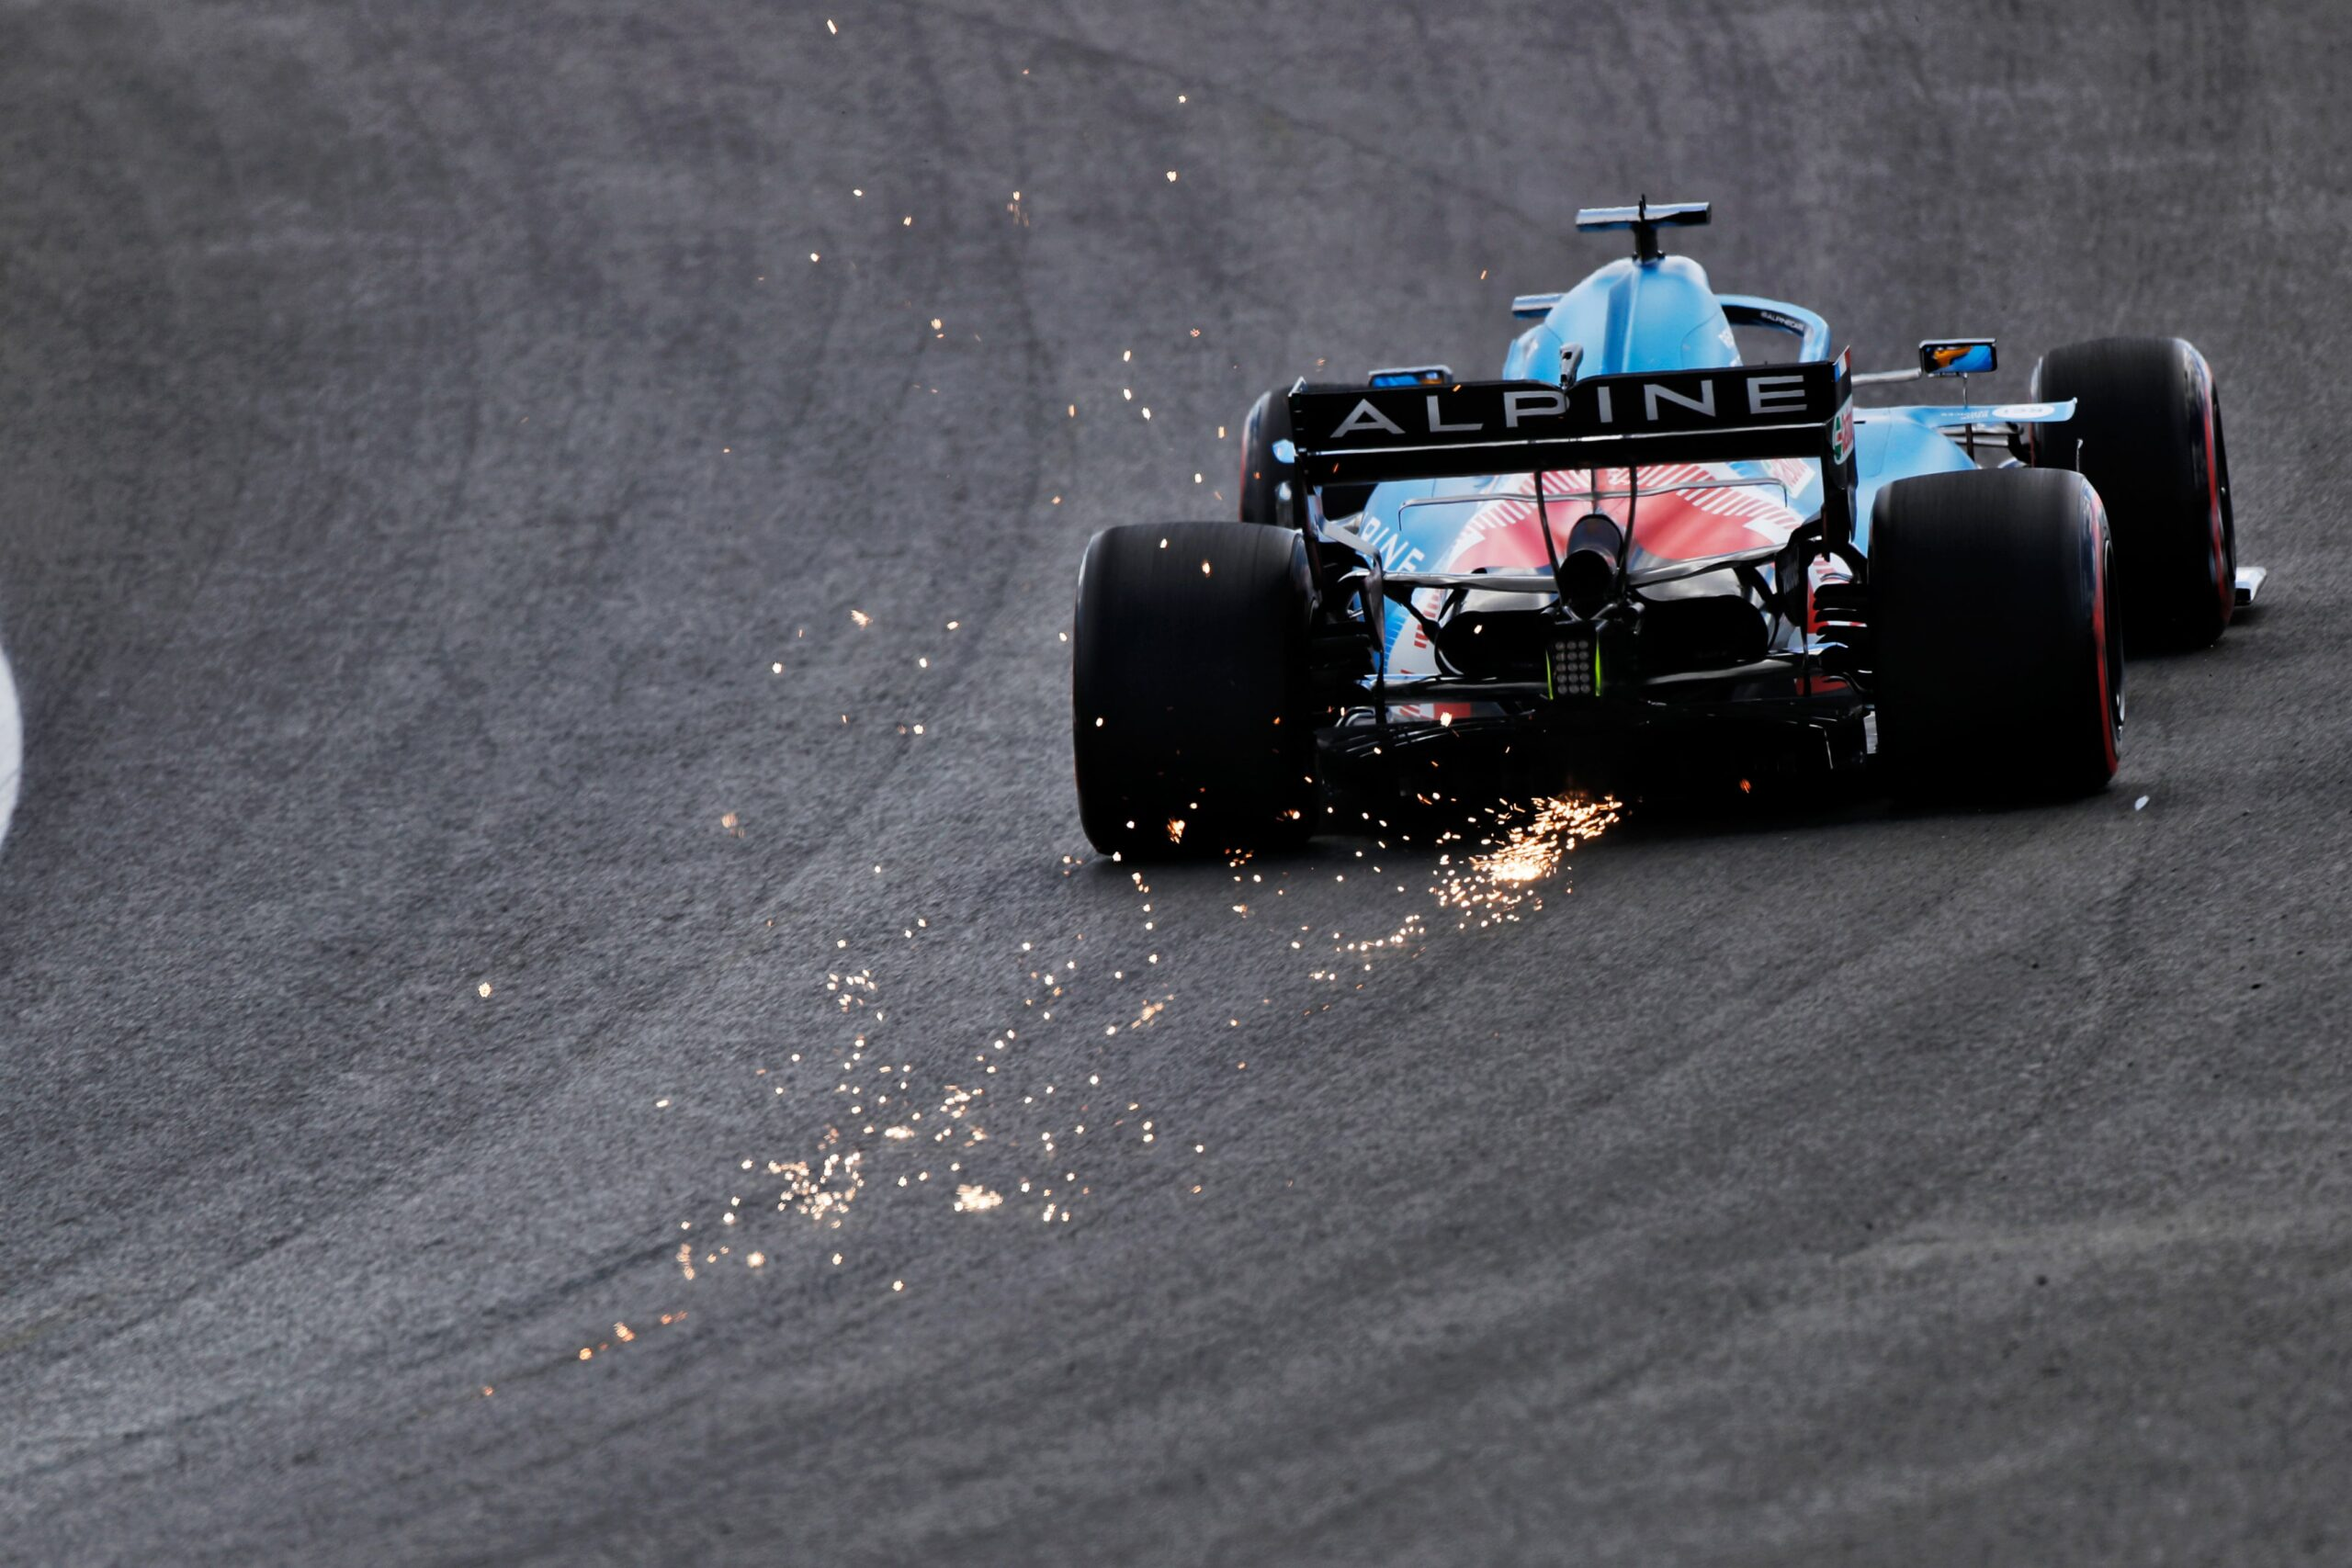 Alpine F1 Team GRAND PRIX HEINEKEN DU PORTUGAL Alonso Ocon 2021 A521 20 scaled   Alpine F1 Team : des essais convaincants au Grand Prix Heineken du Portugal